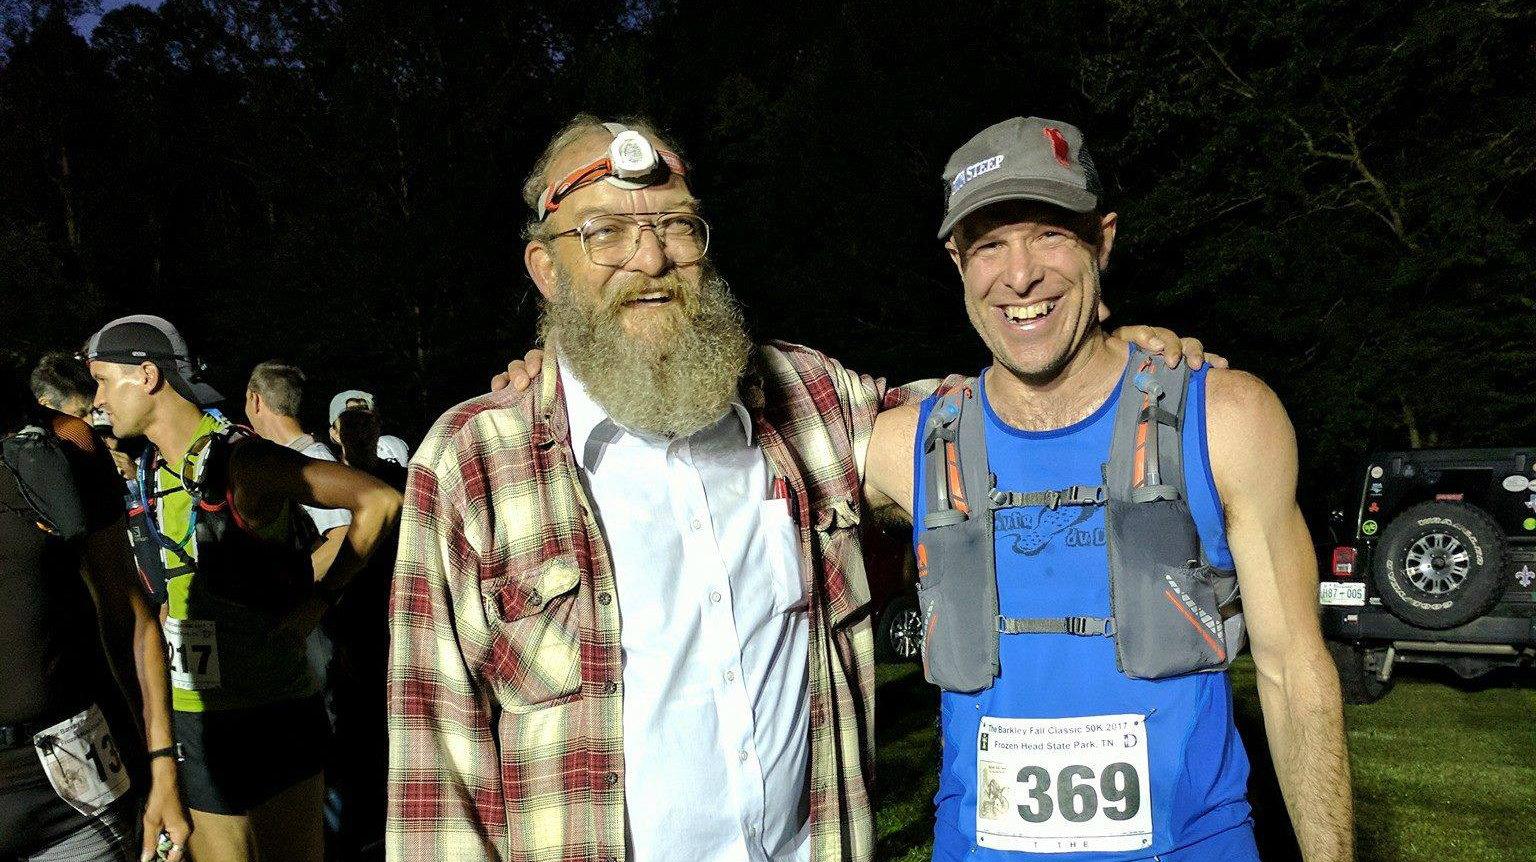 Mario Villemure (droite) avec Lazarus Lake - Photo: Courtoisie